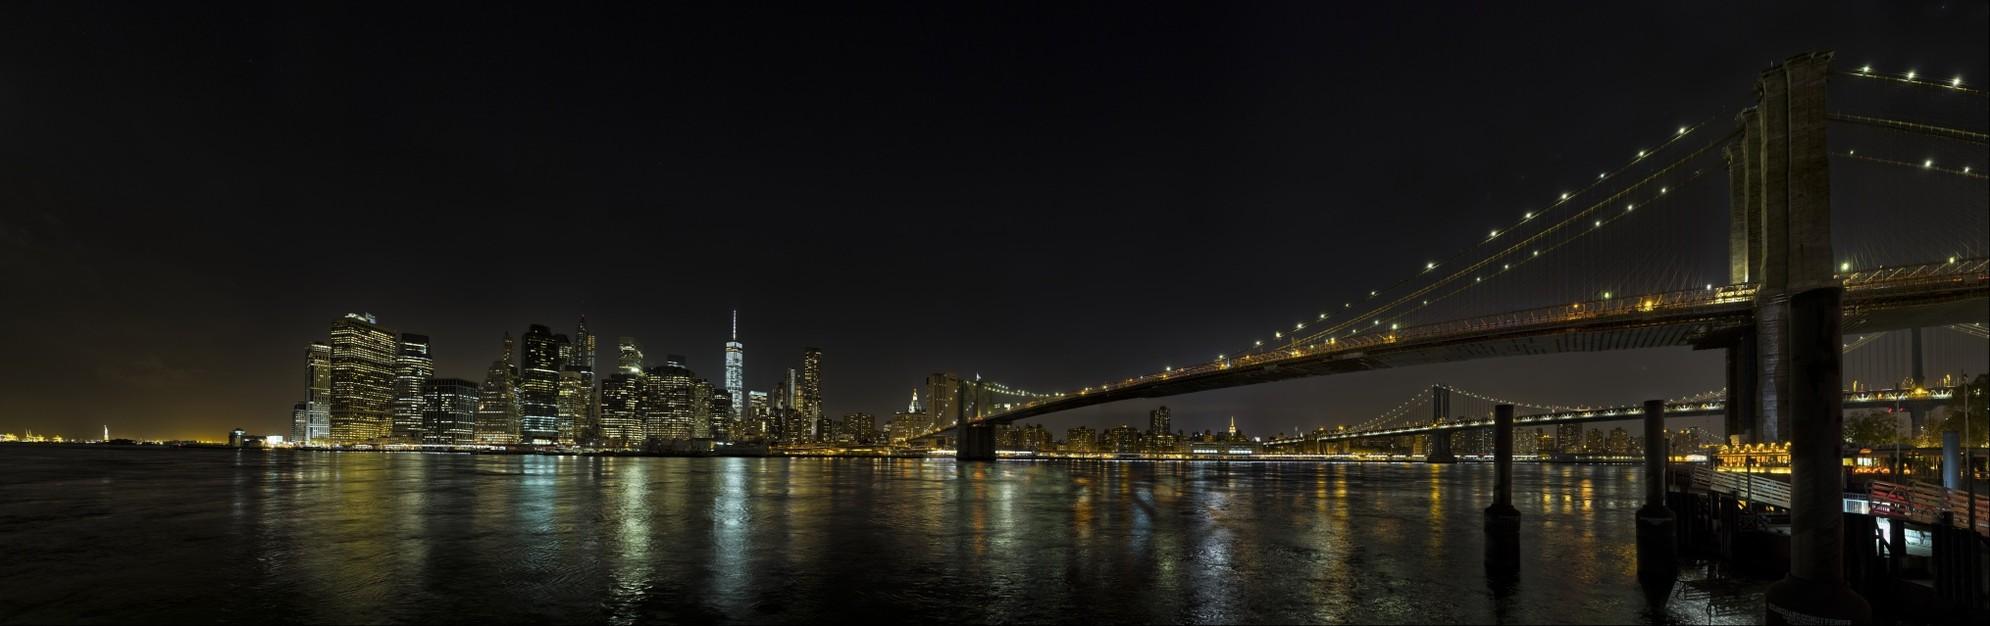 Brooklyn Bridge Park, brooklyn, NY.